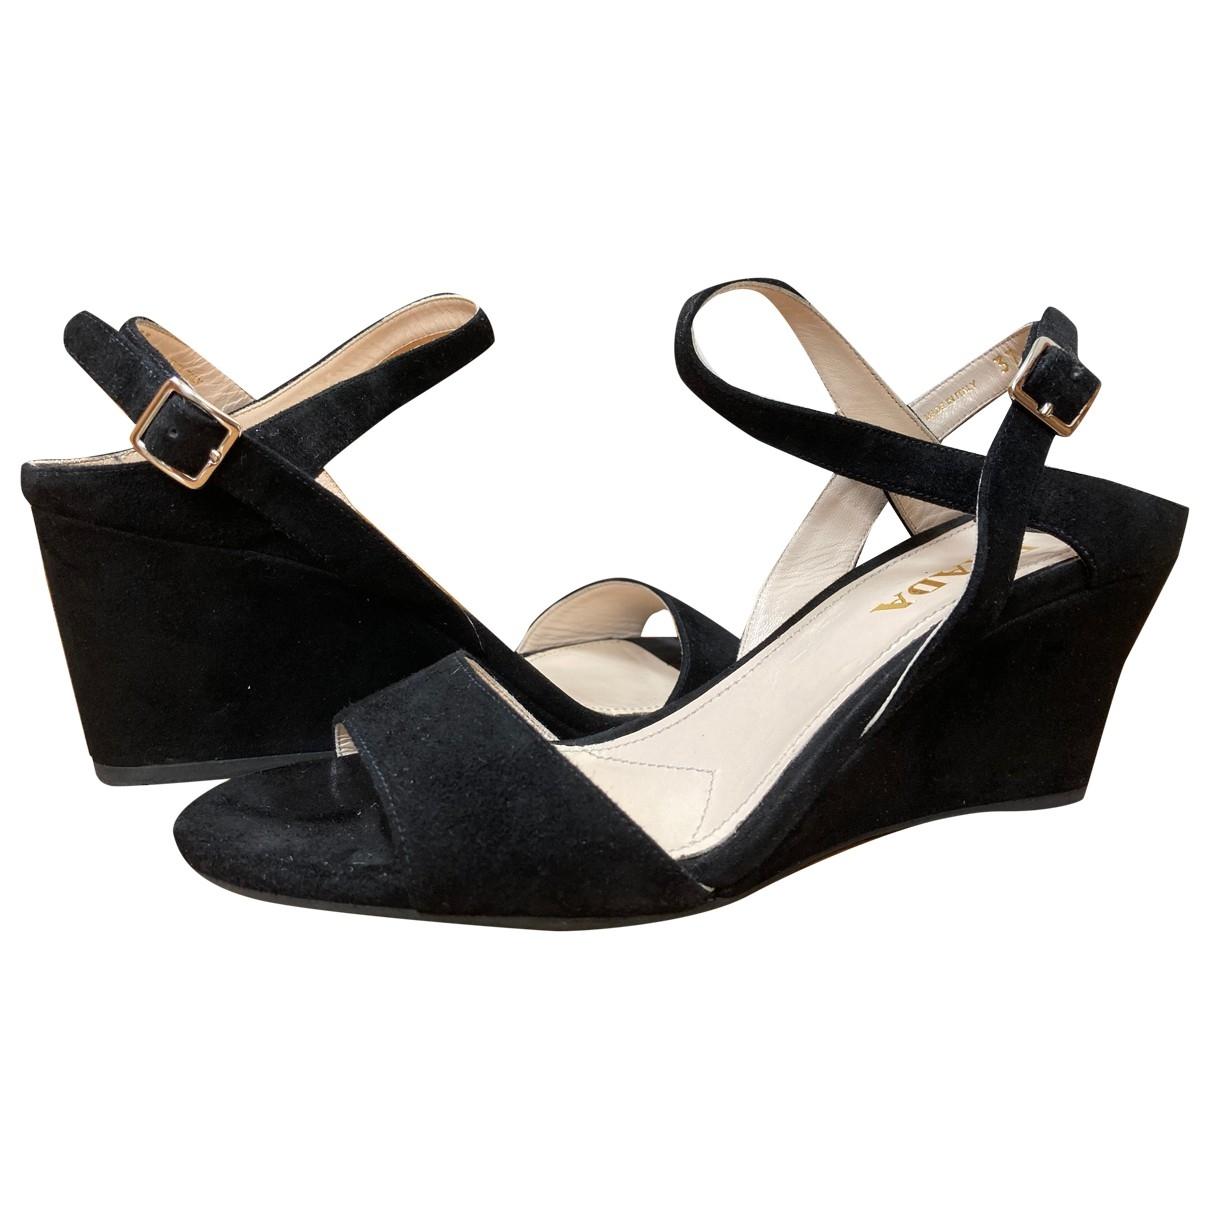 Prada \N Black Suede Sandals for Women 37 EU